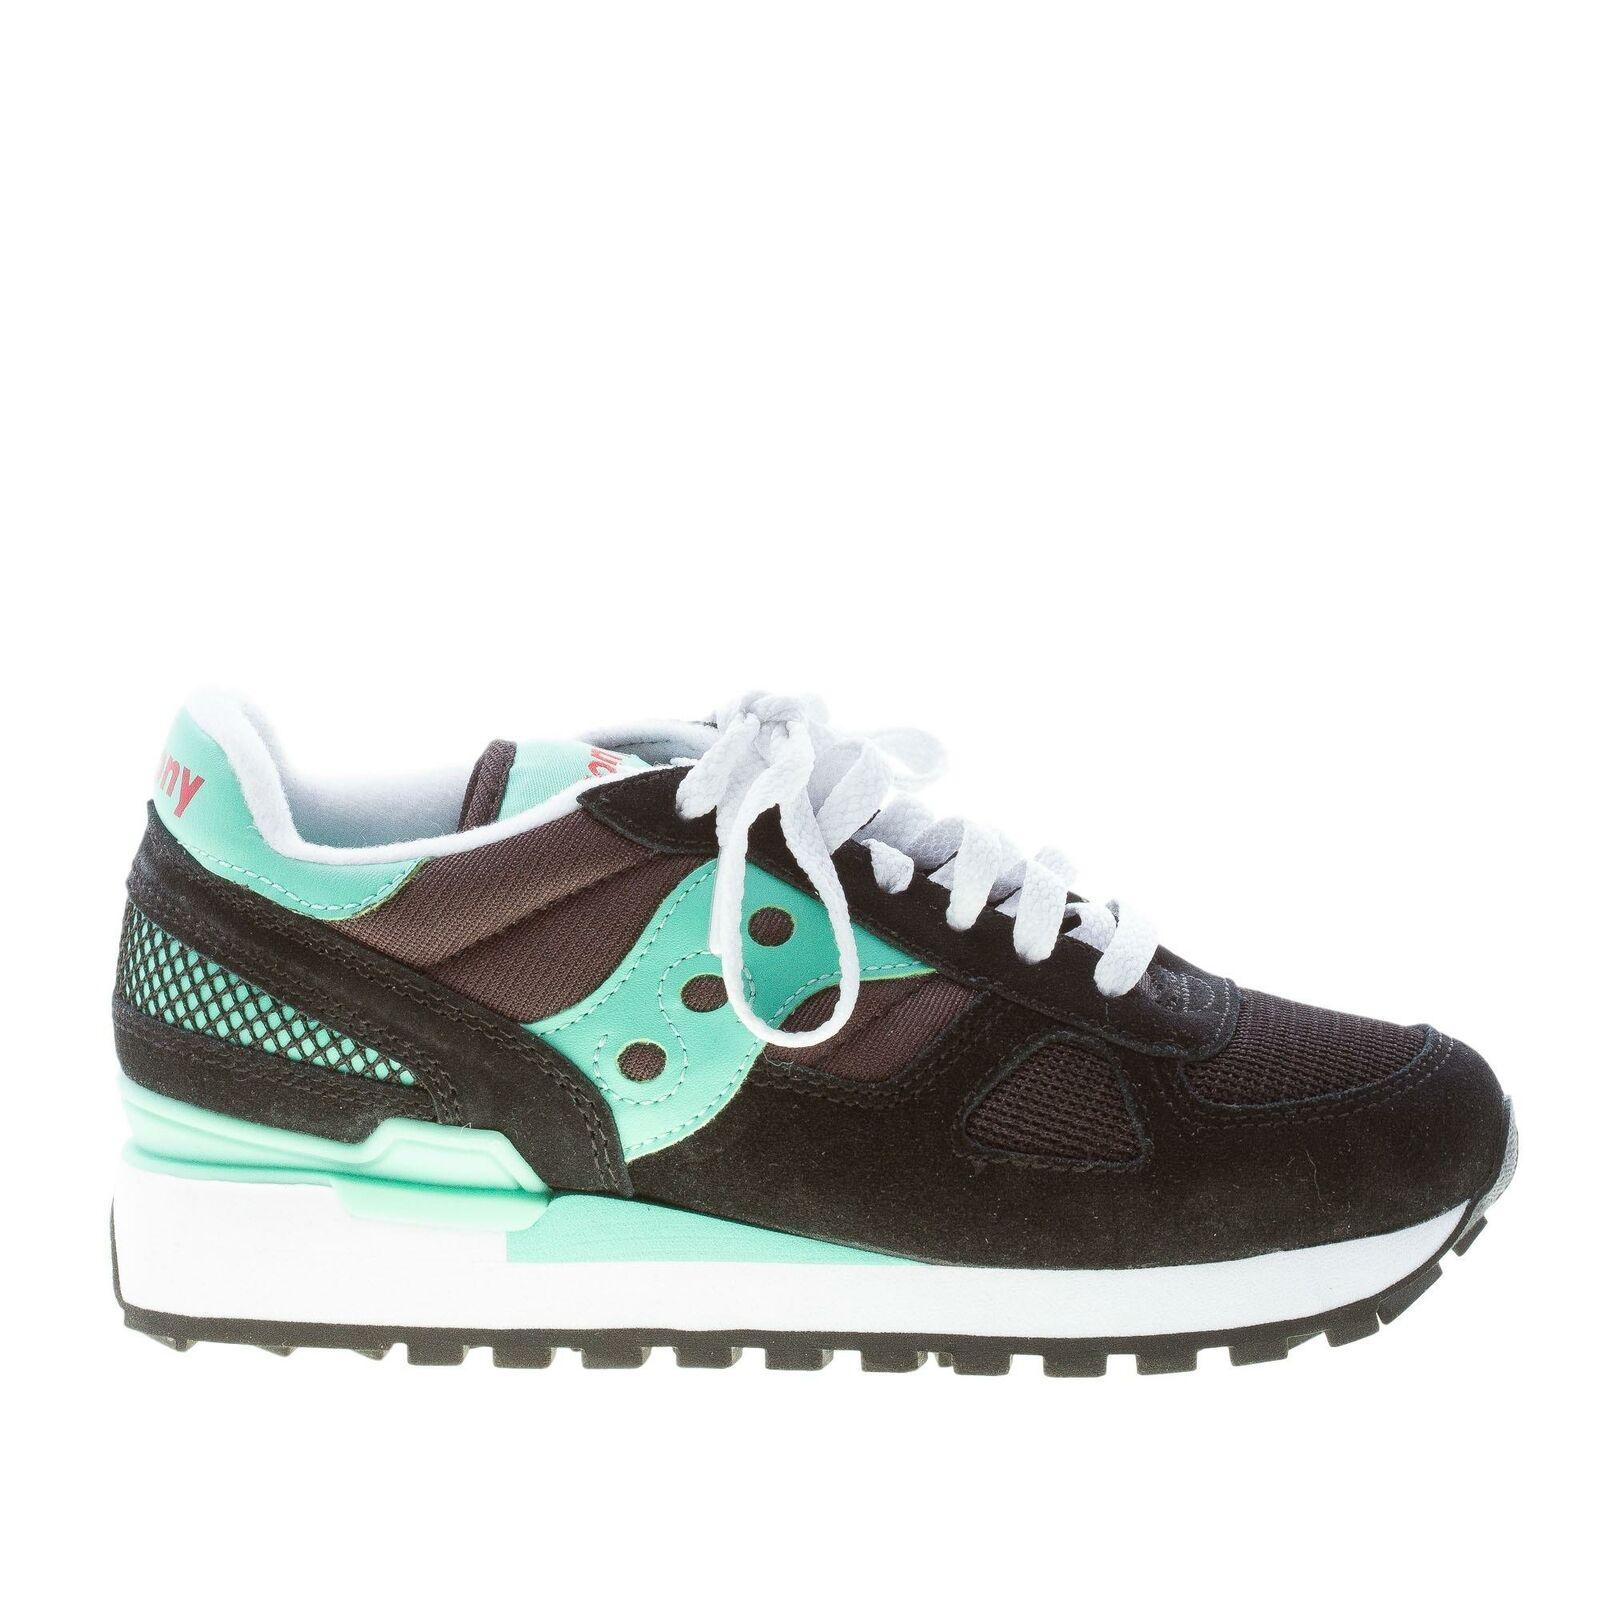 SAUCONY scarpe donna scarpe da ginnastica Shadow tessuto camoscio nero pelle verde acqua